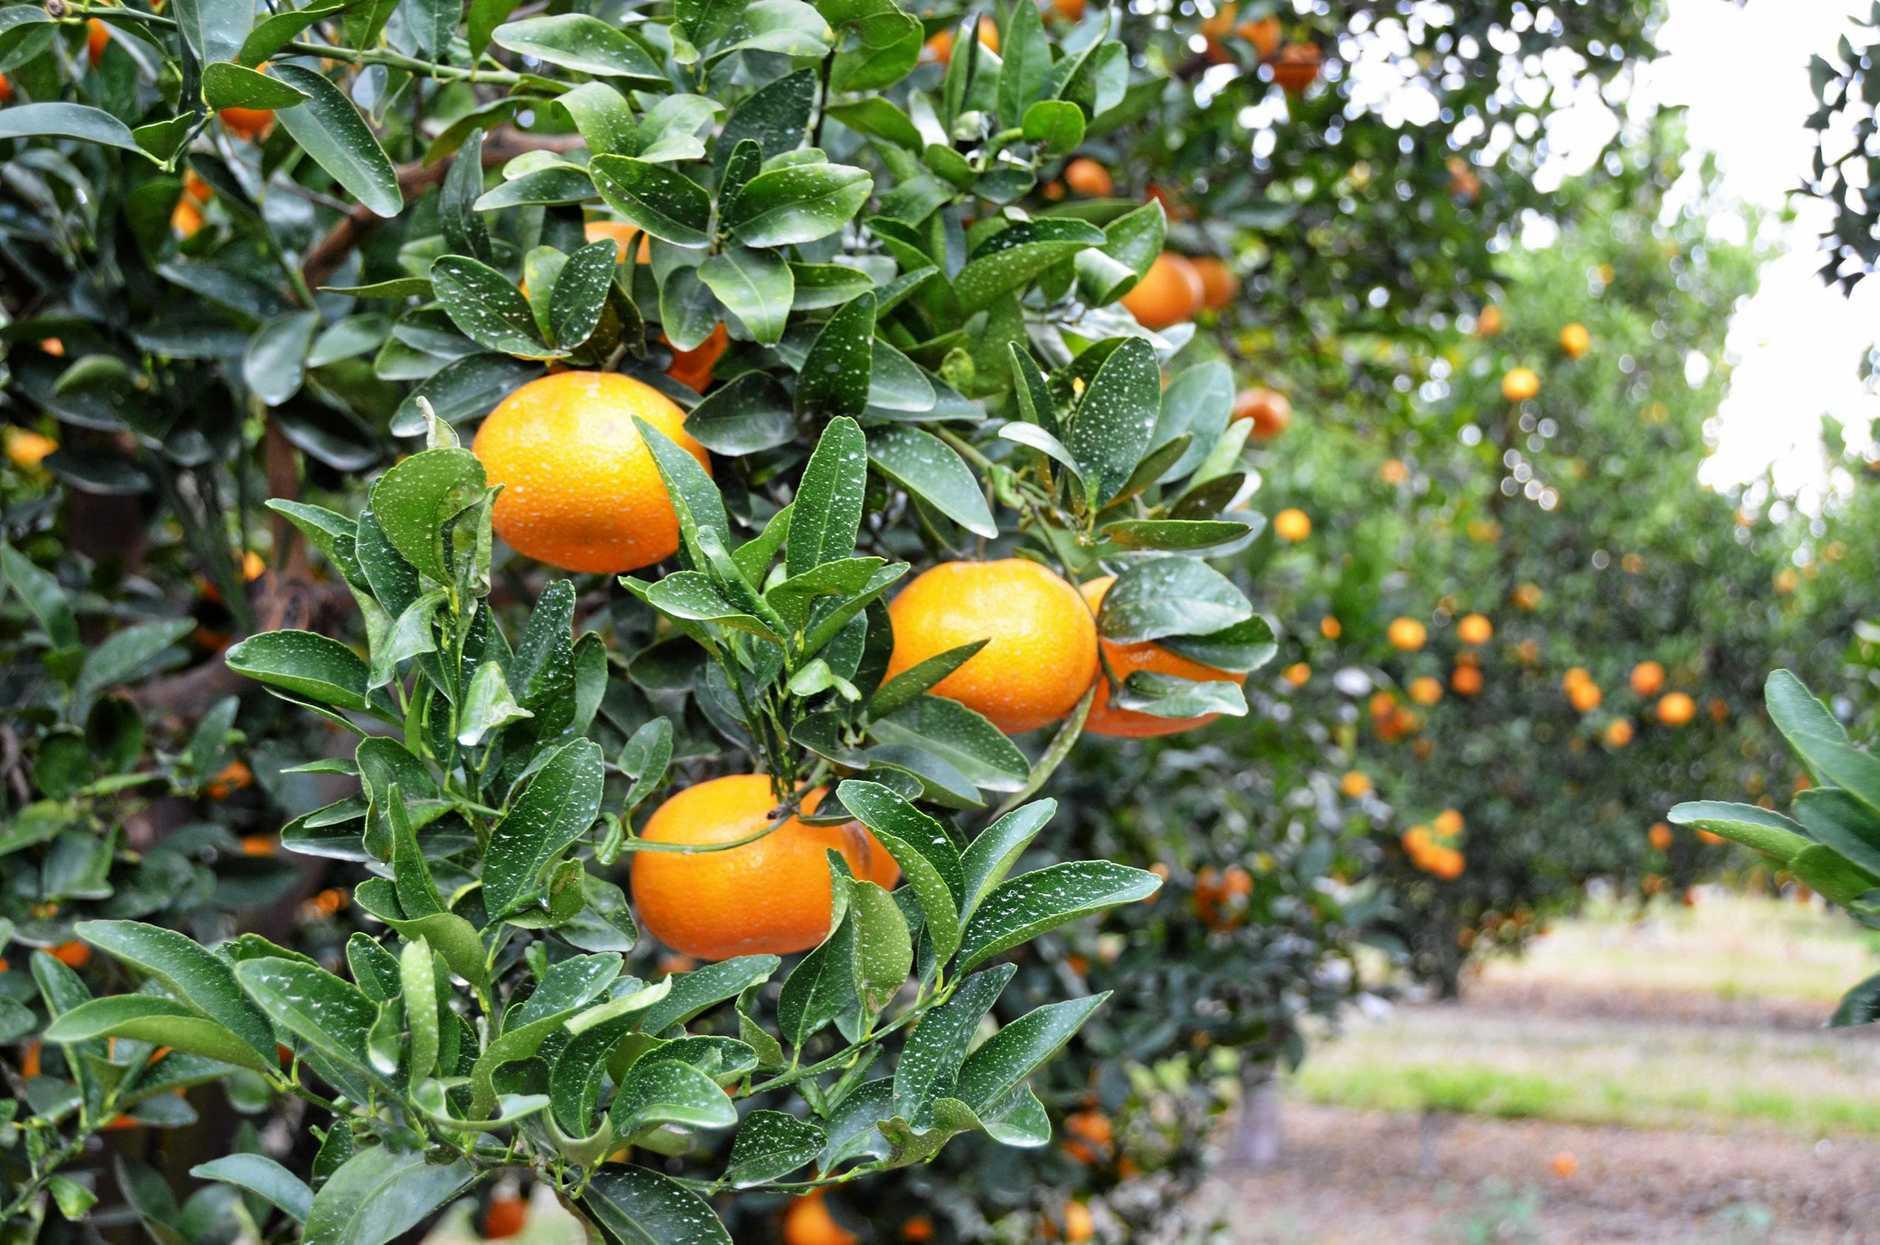 Sandbar Citrus are preparing for a busy Murcott season.